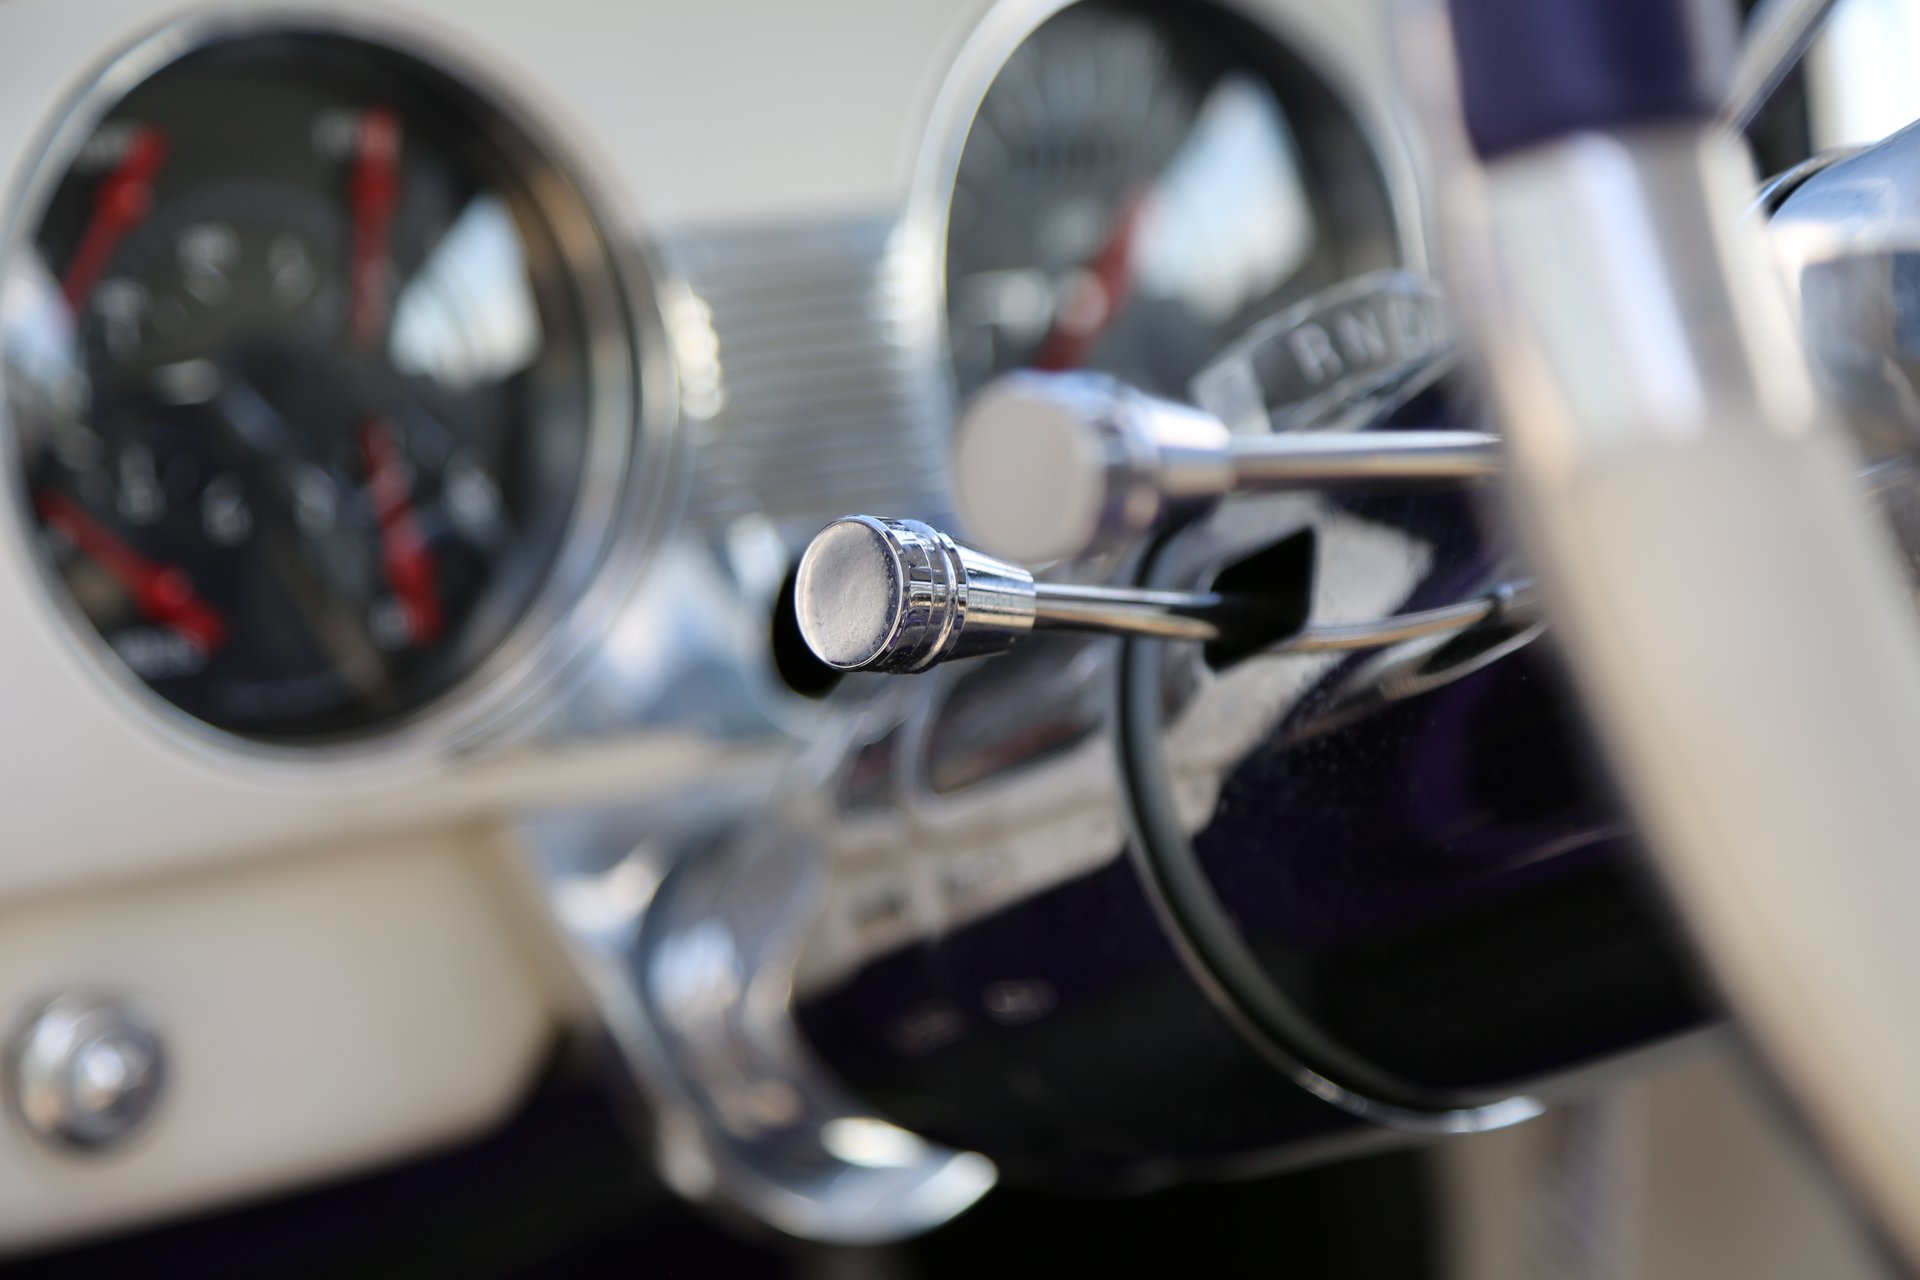 1951 Chevrolet Bel Air Burnyzz American Classic Horse Power Chevy Steering Wheel